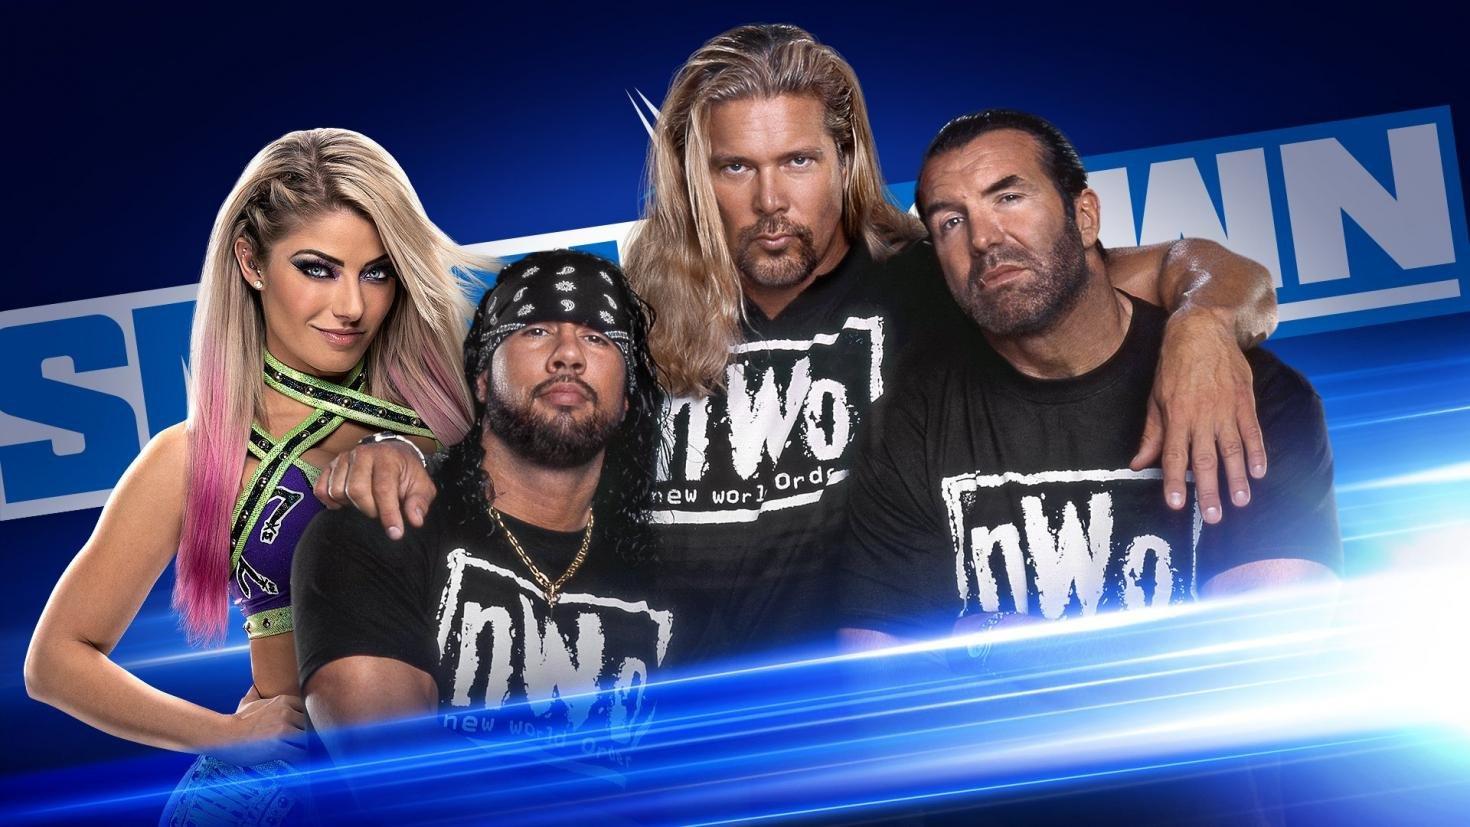 WWE Smackdown Preview (06/03/20): nWo, Gauntlet, Sasha Bayley-Lacey Evans Naomi 4